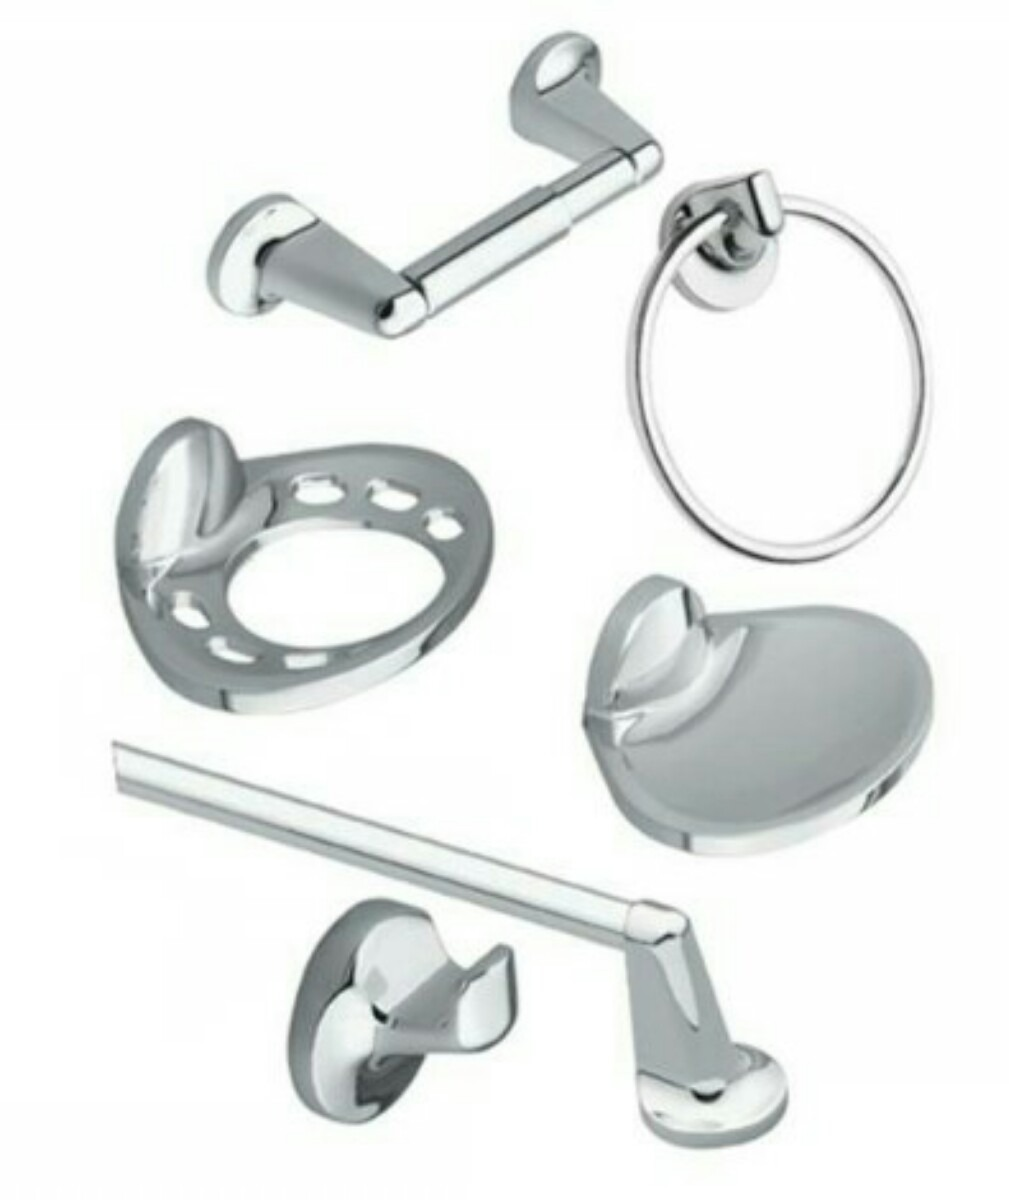 Juegos de accesorios para sala de ba os cromados 6 piezas - Accesorio de bano ...